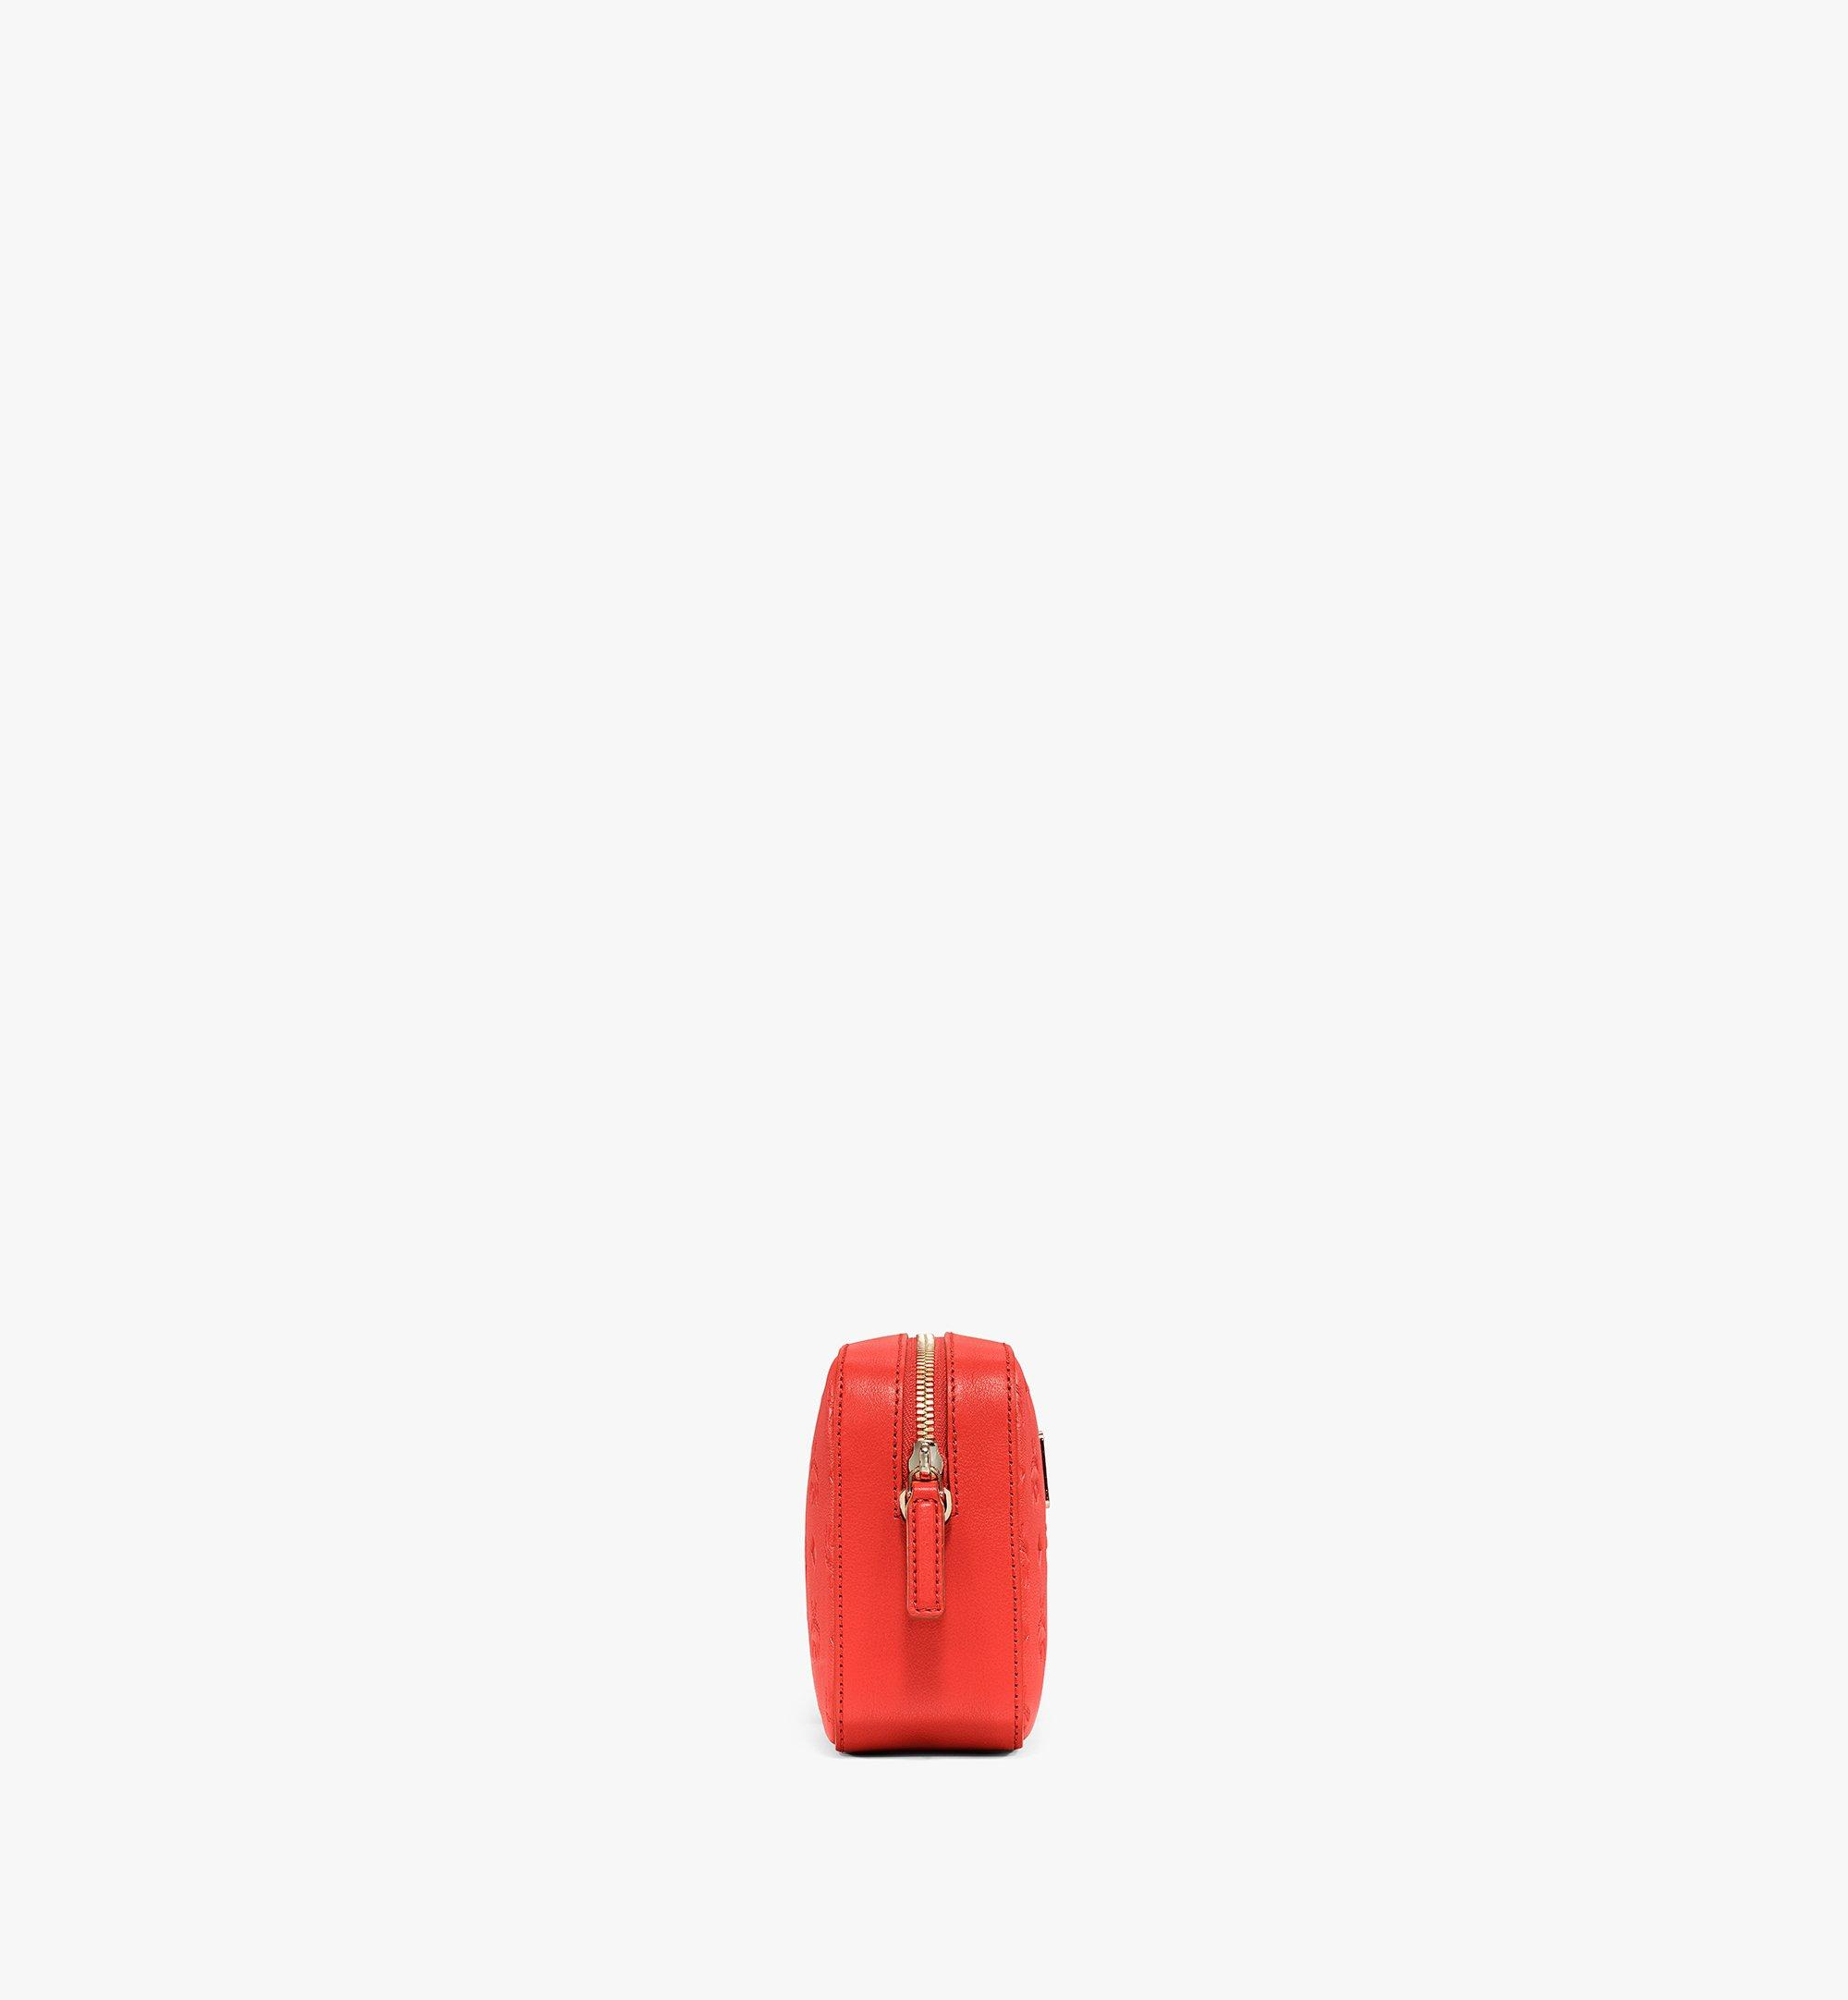 MCM Camera Bag in Monogram Leather Red MWRAAKM01R8001 Alternate View 1